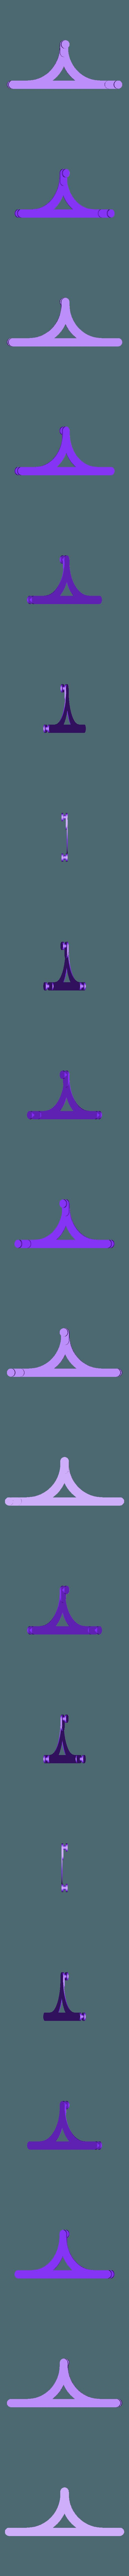 Bottom-T-Strap.75.stl Download free STL file Flexible Filament Bikini Top and Bottom • 3D printable design, SexyCyborg